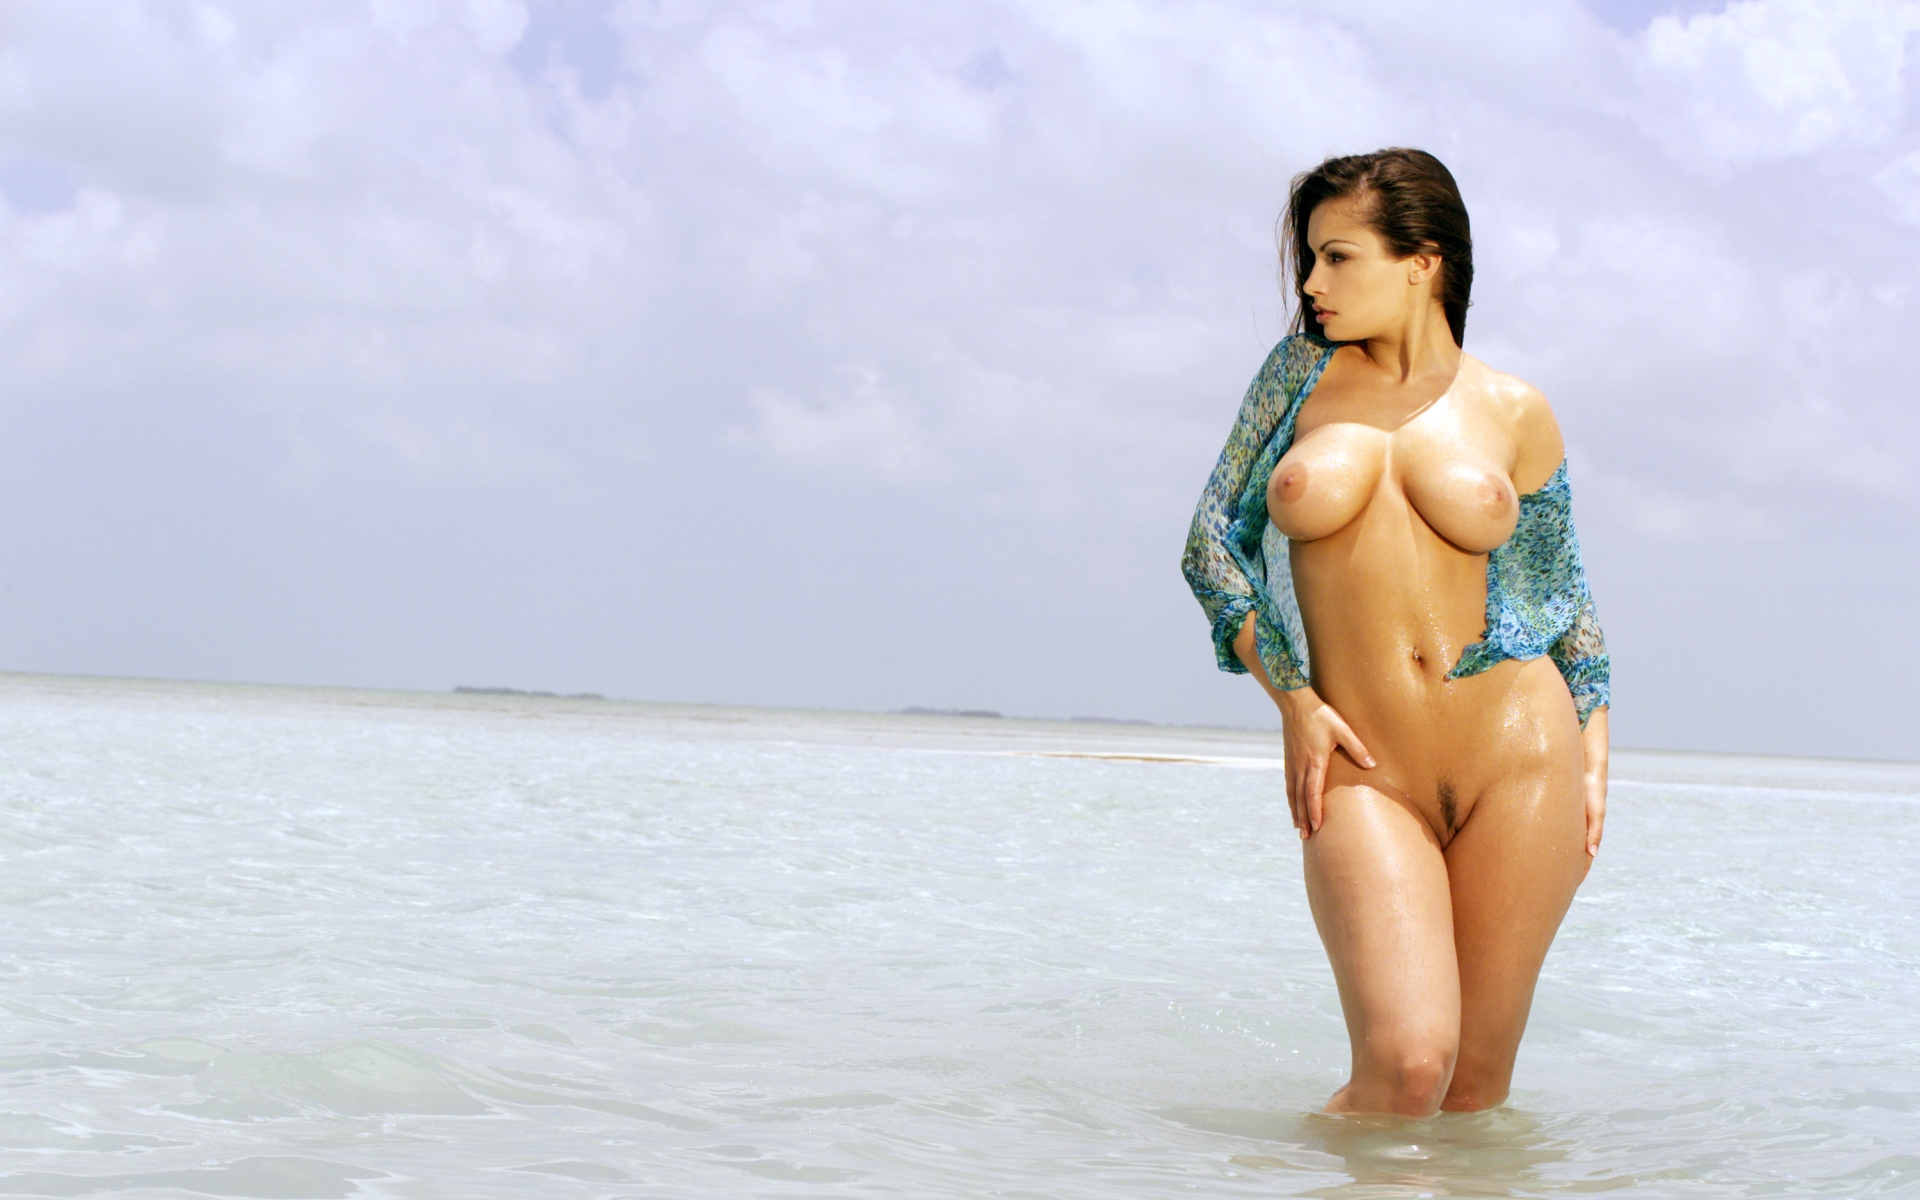 Amateur big women pics